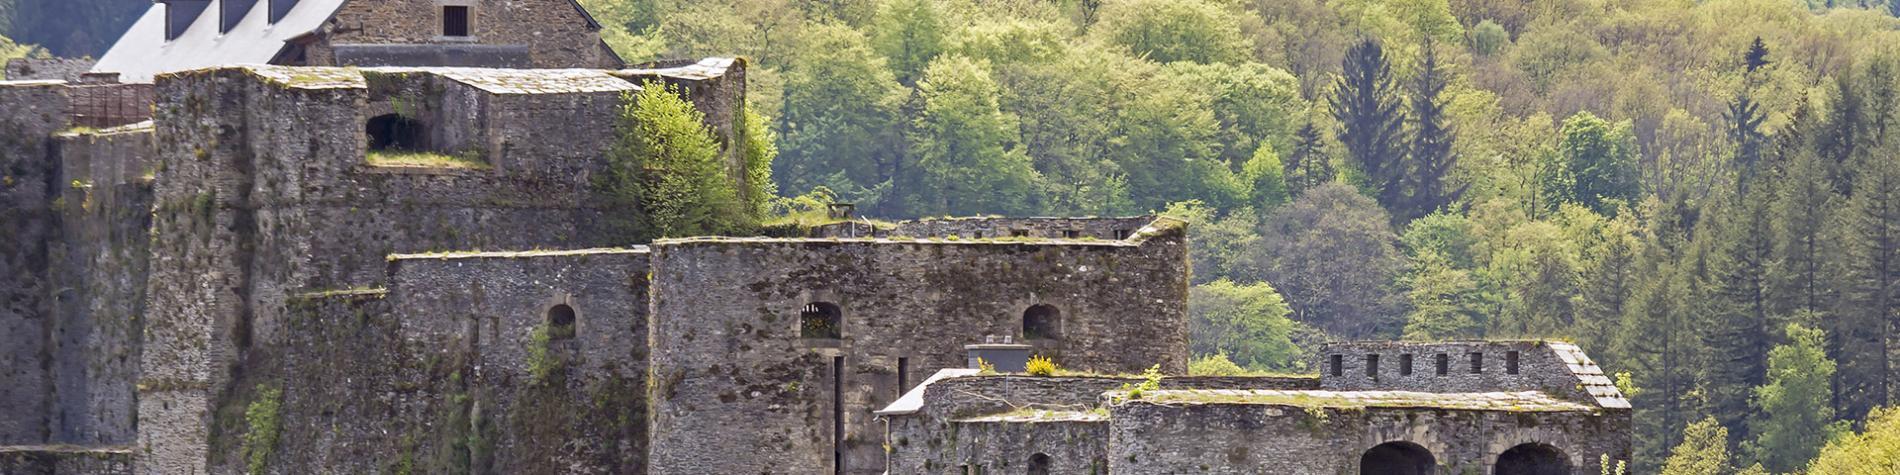 Château - médiéval - Bouillon